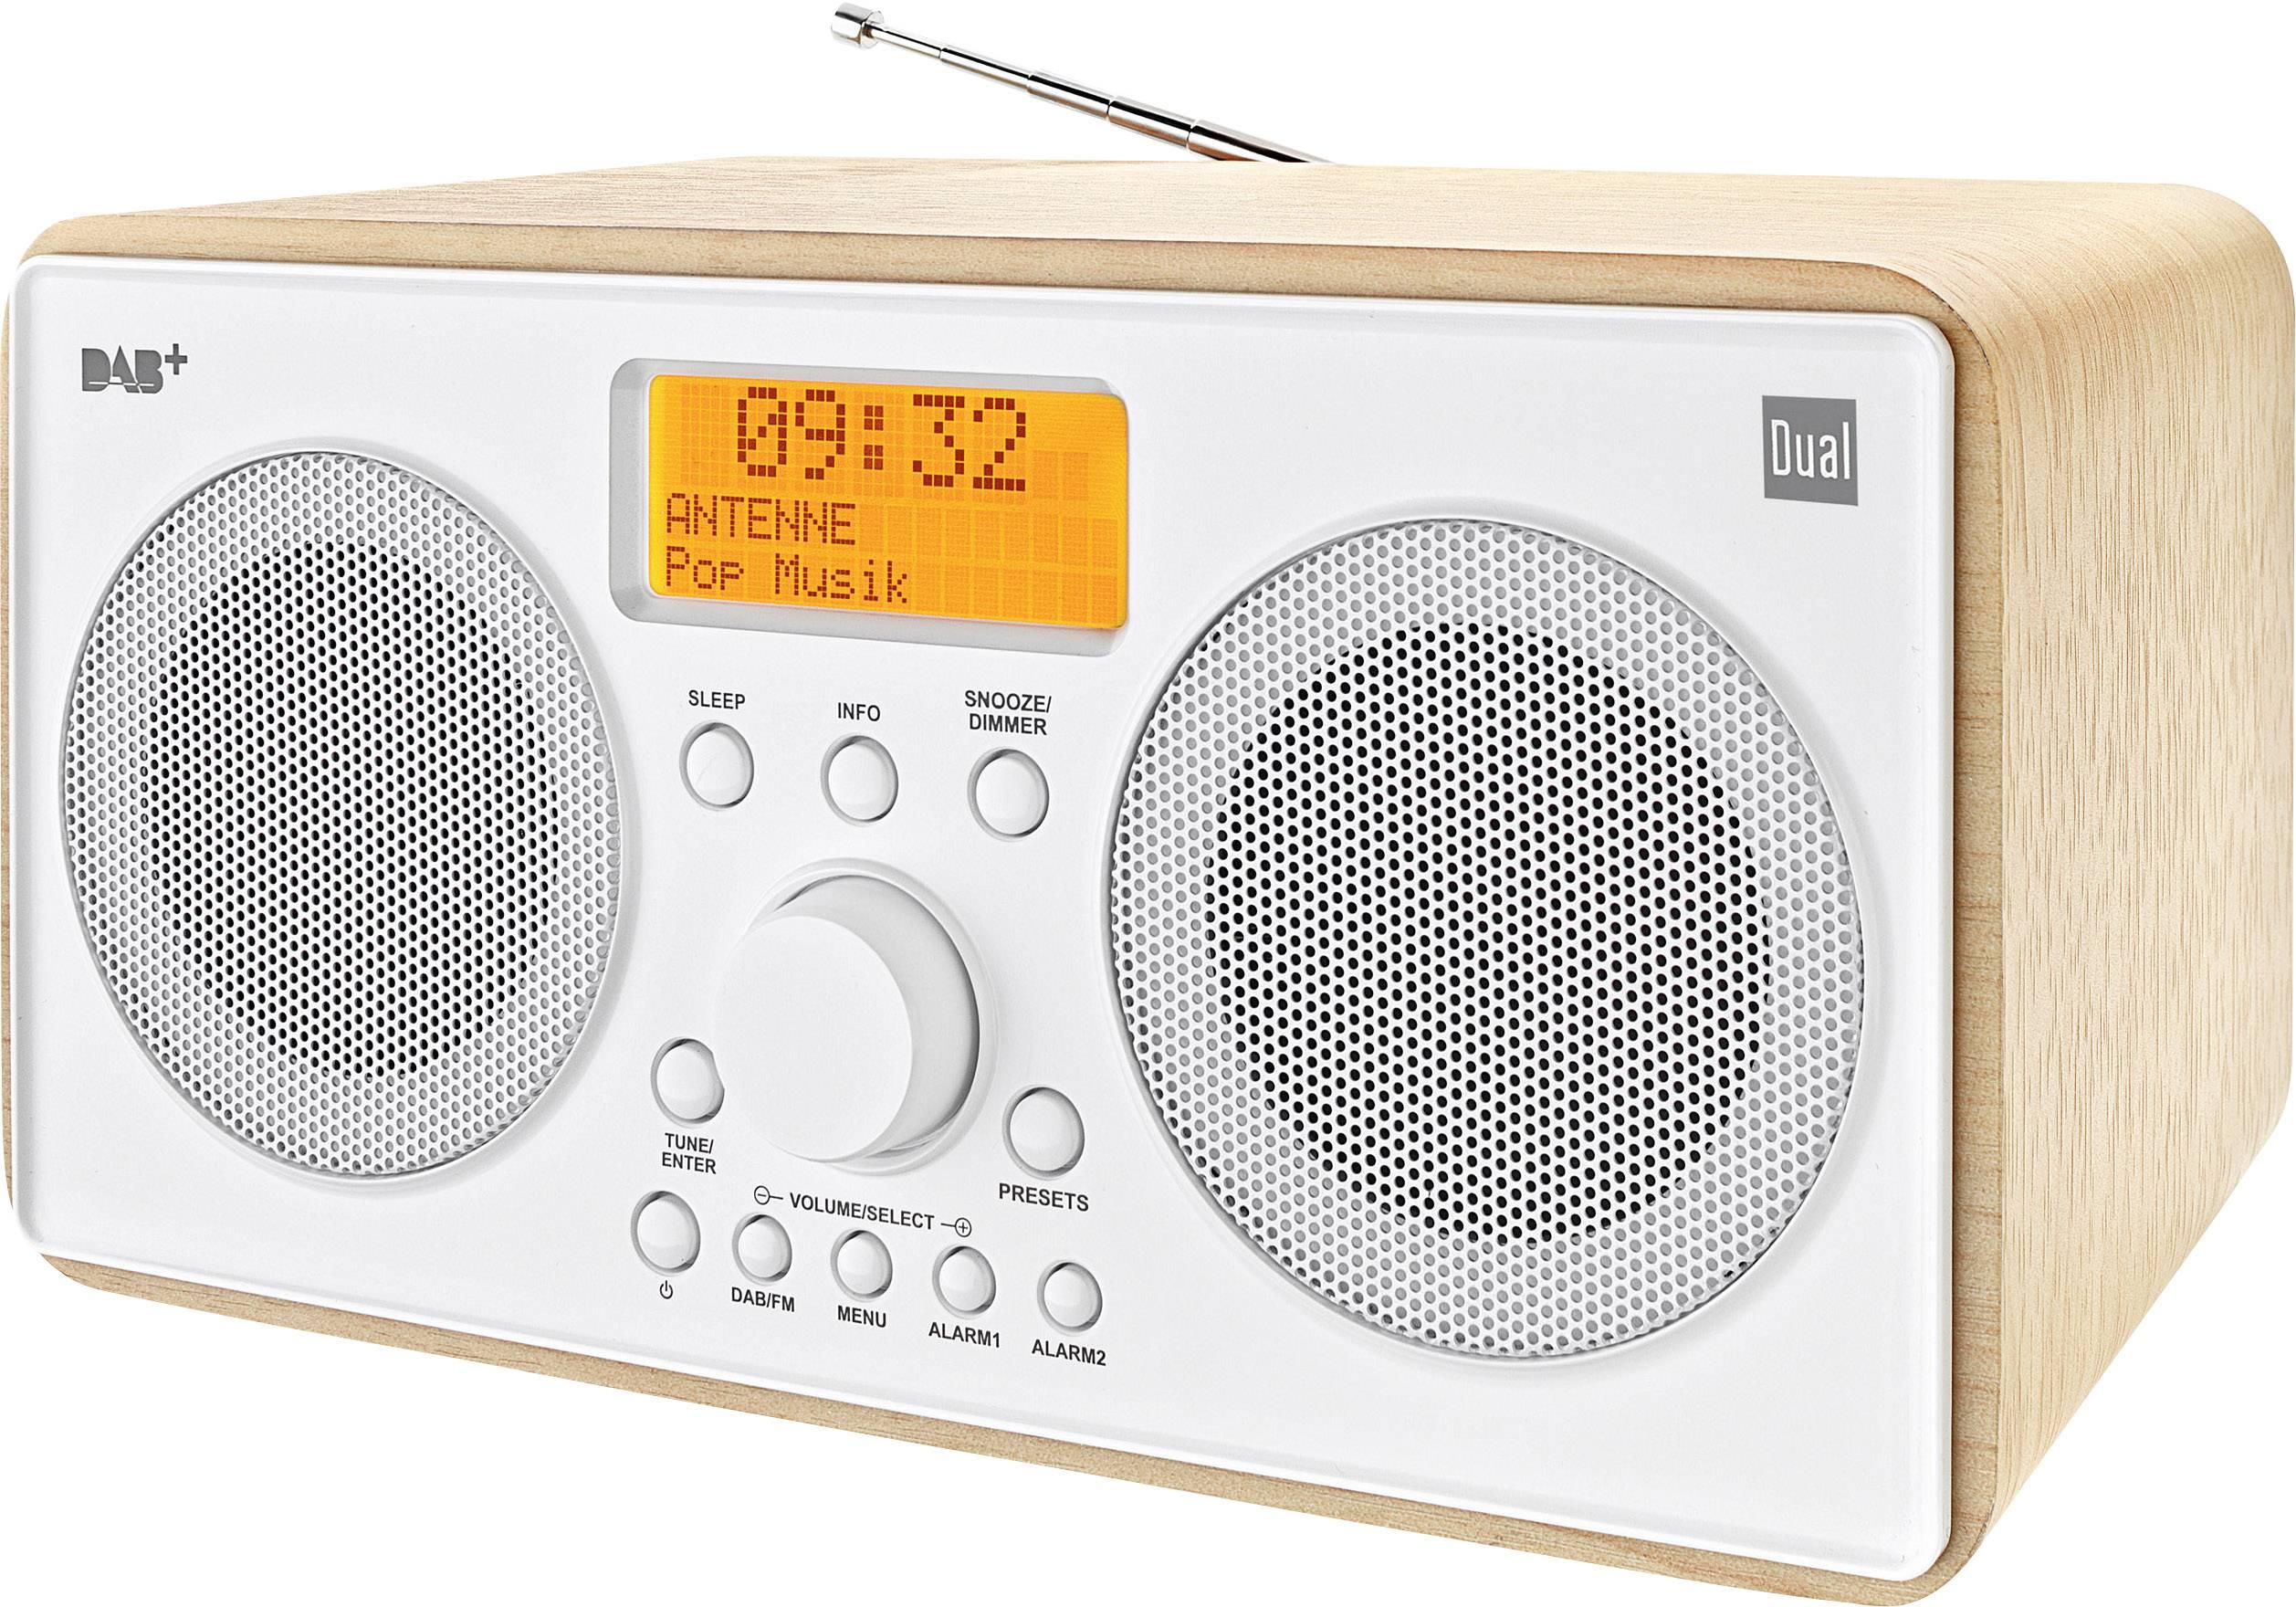 DAB+ stolní rádio Dual DAB 27, DAB+, FM, dřevo